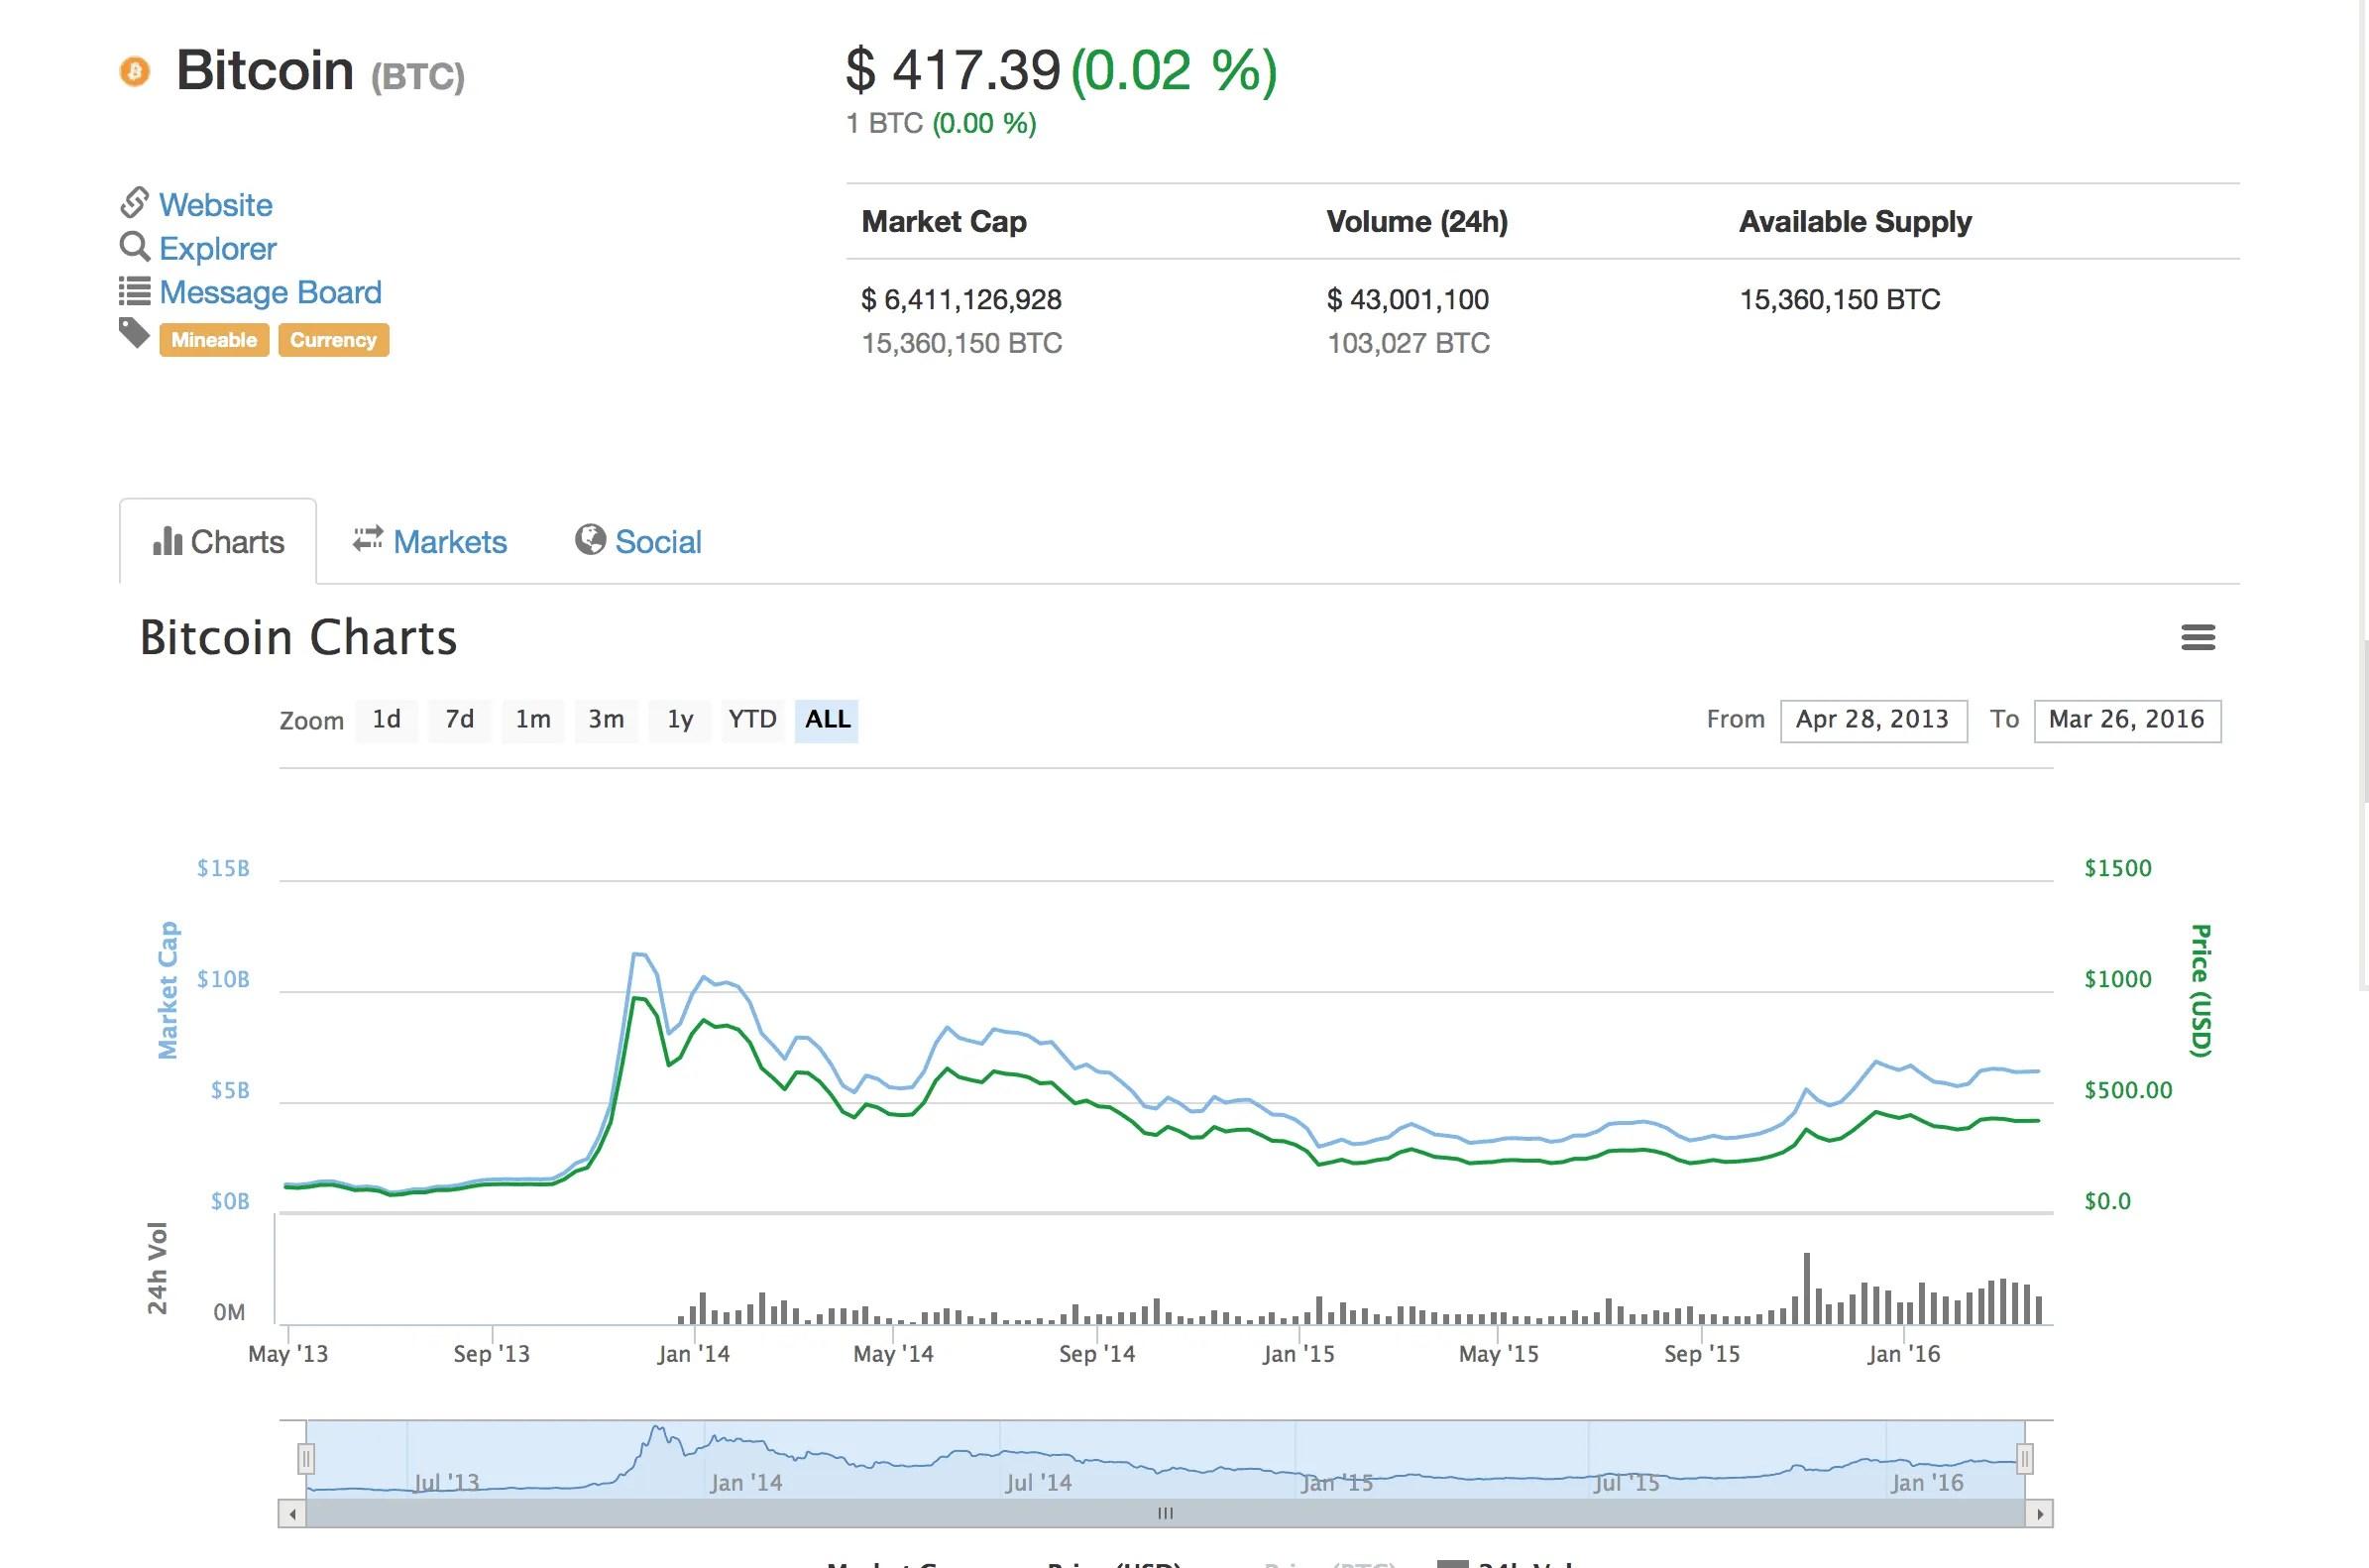 BitcoinMarketCap